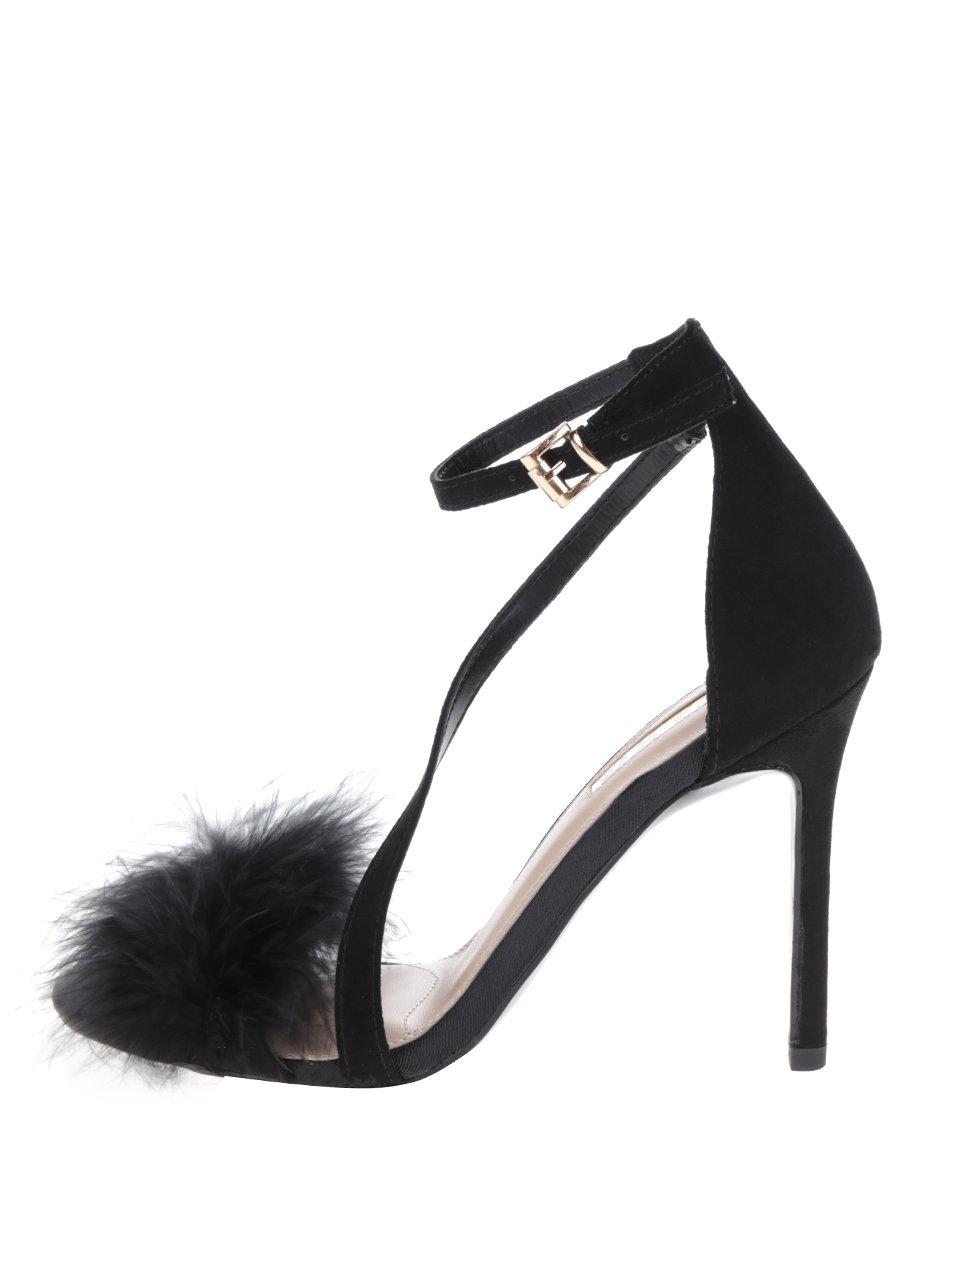 1e4b03836650 Čierne sandálky v semišovej úprave na ihlovom podpätku Miss KG Flirt